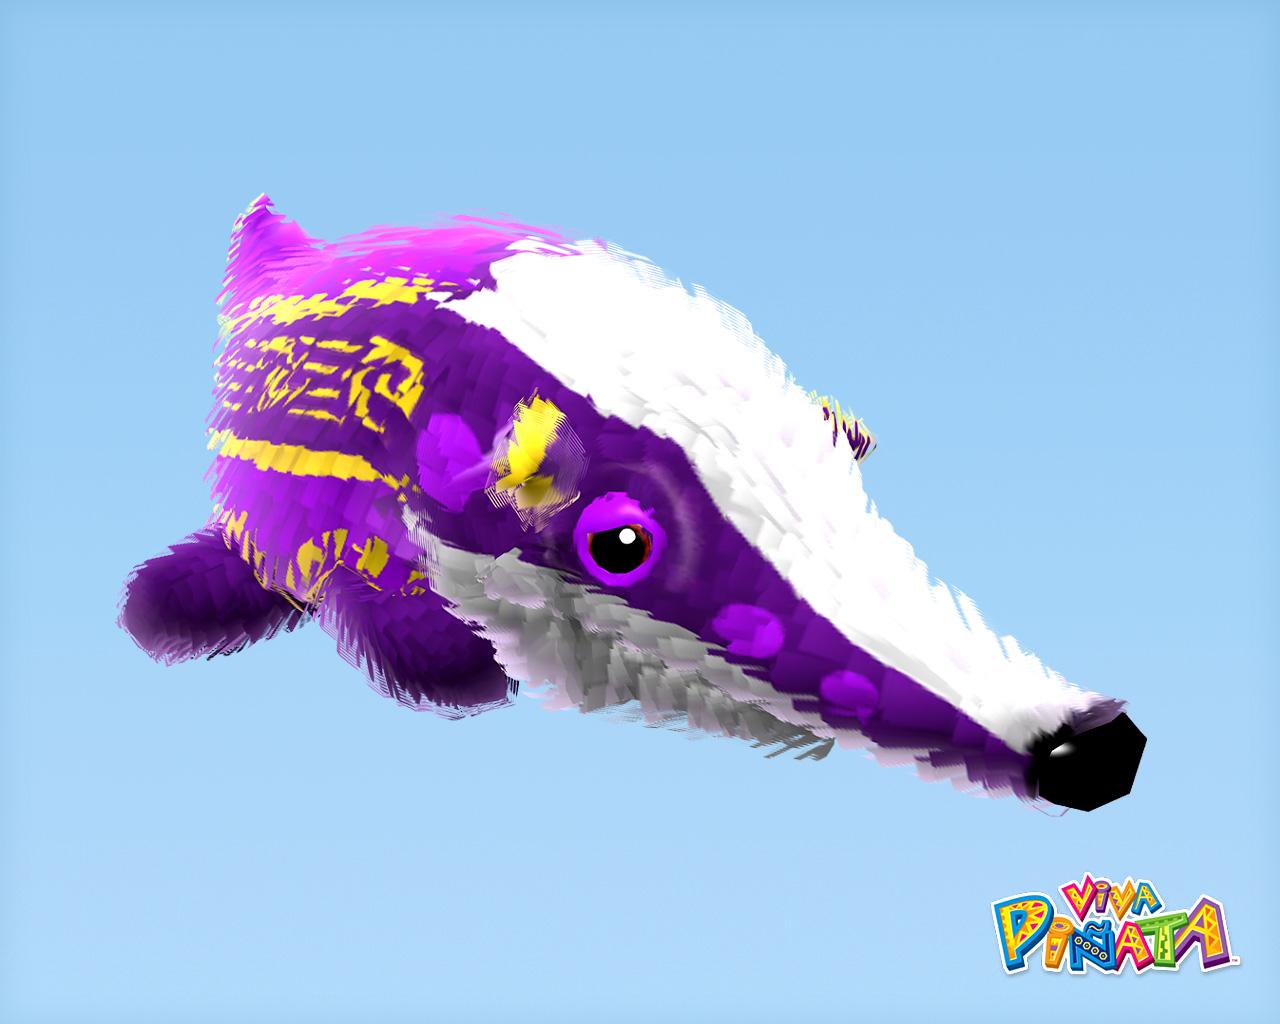 Badgesicle Viva Piñata Wiki Fandom Powered By Wikia